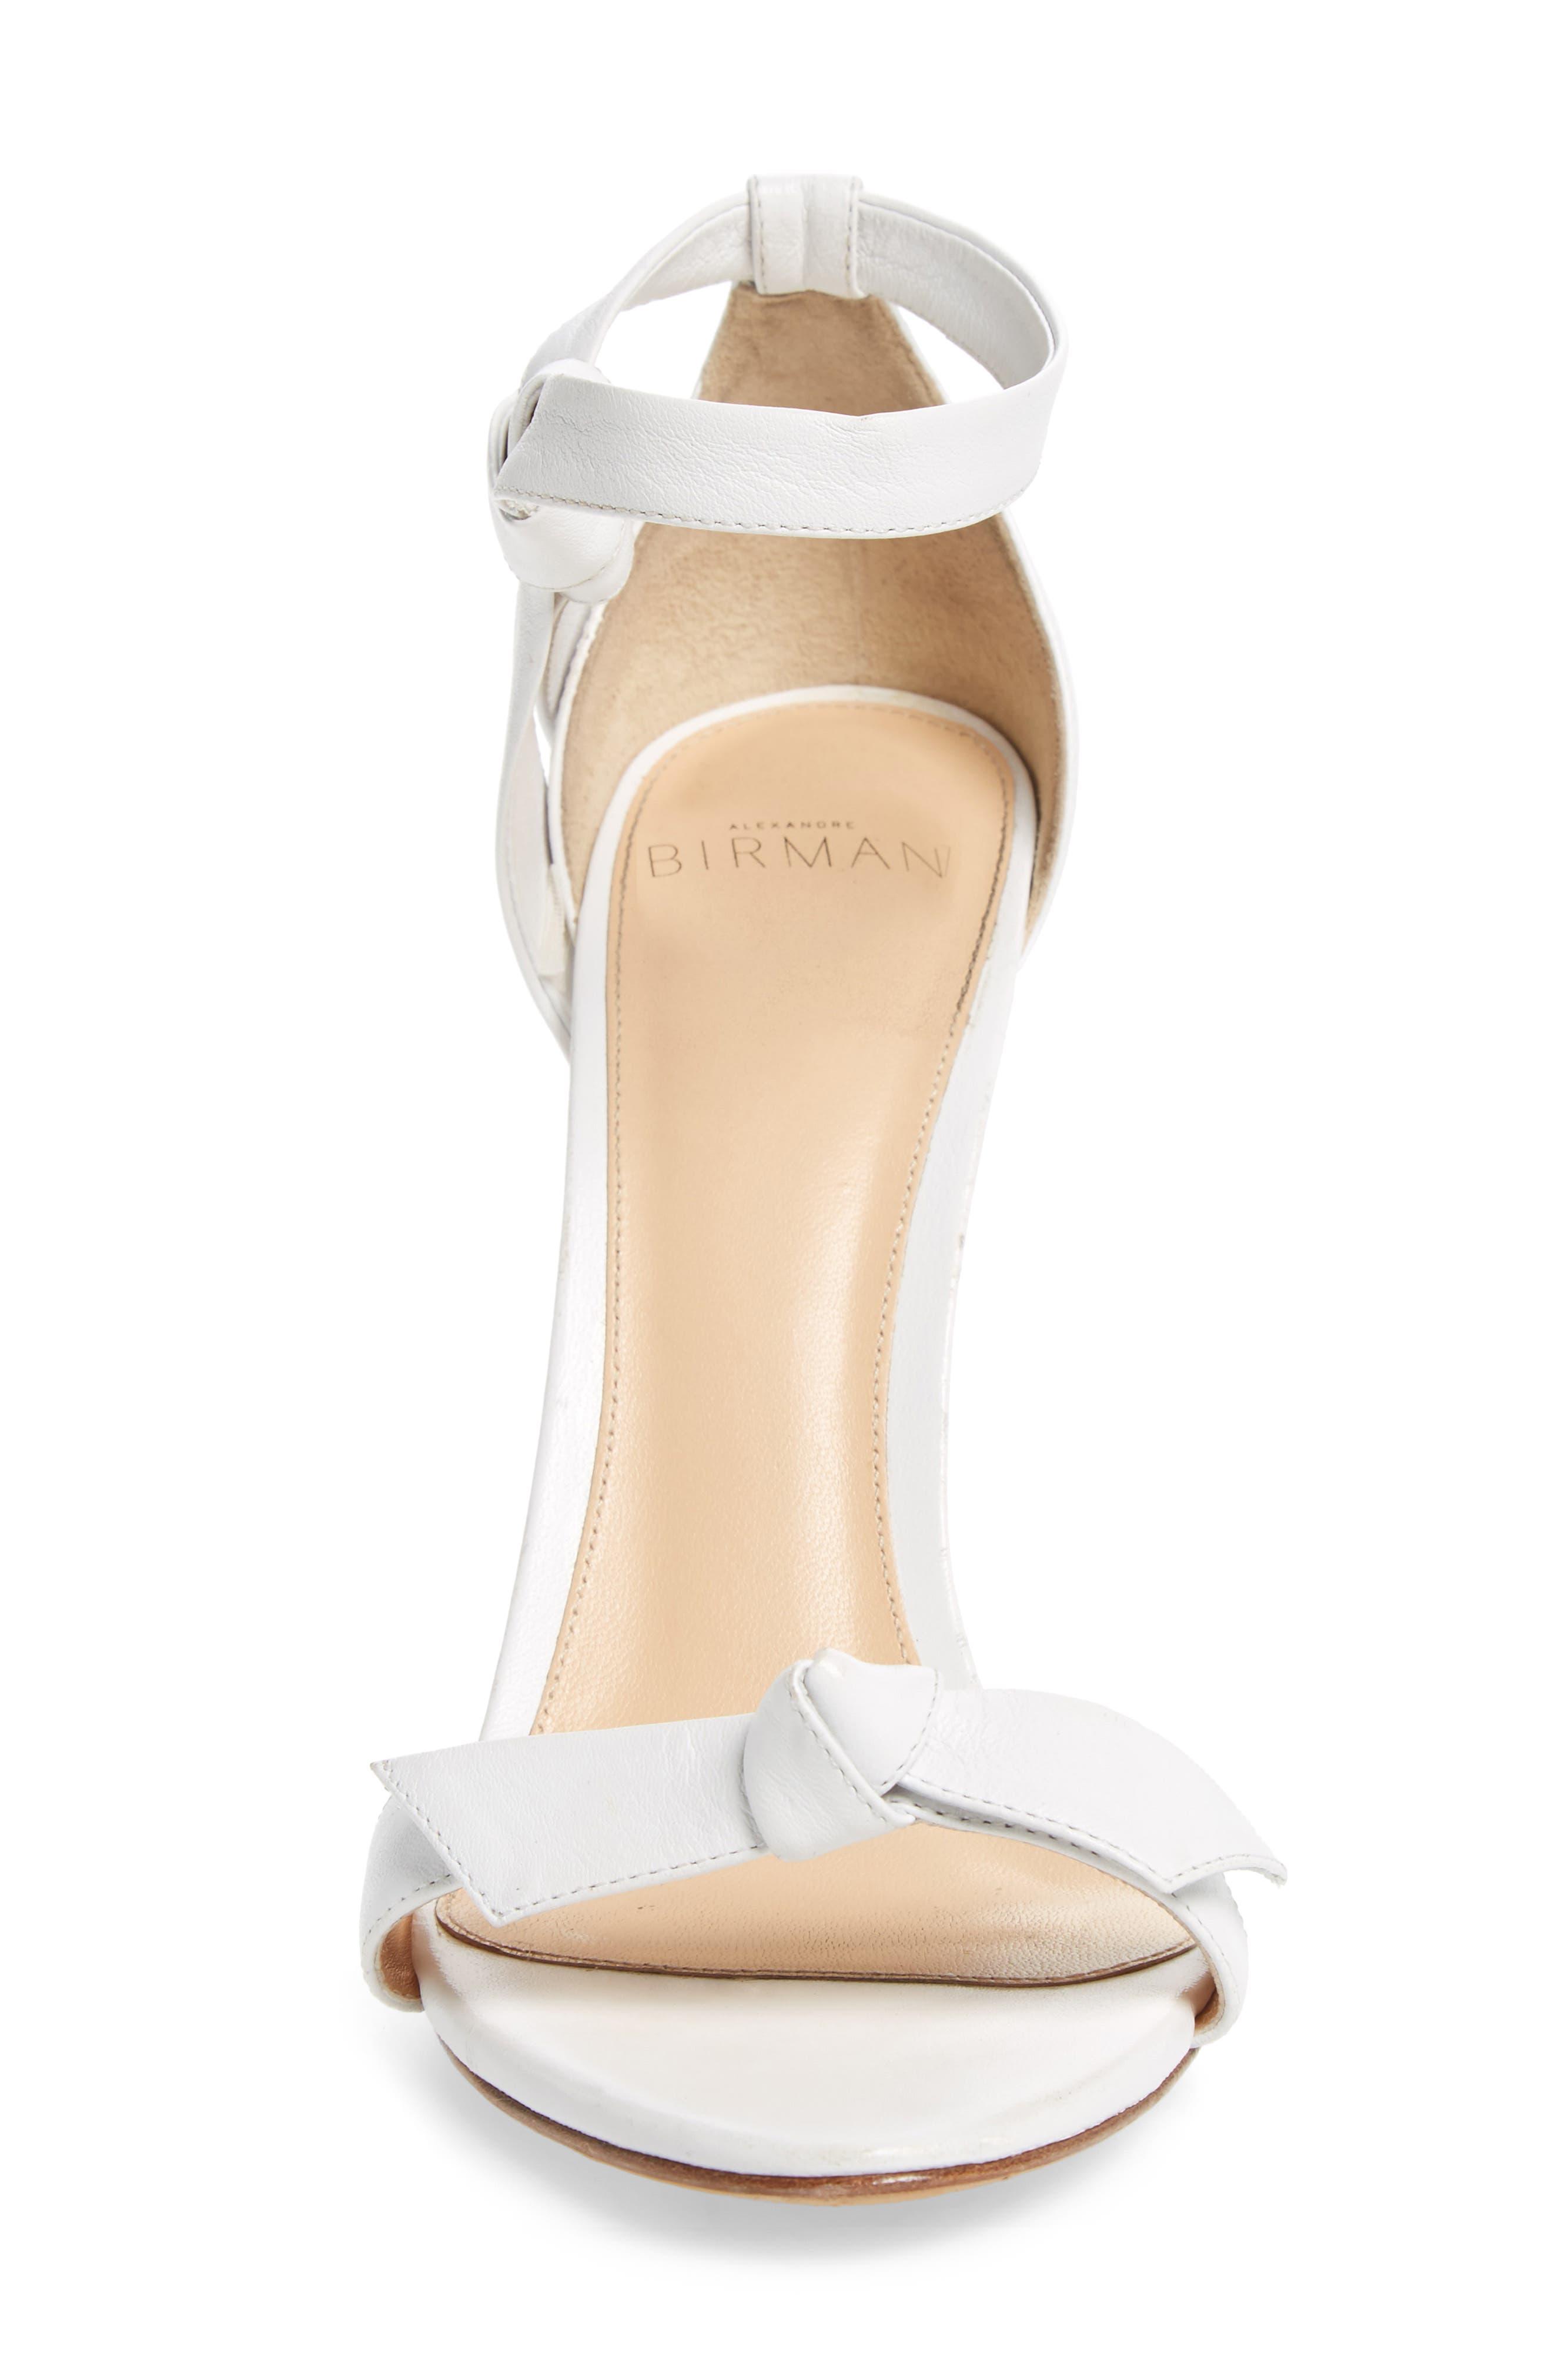 'Clarita' Ankle Tie Sandal,                             Alternate thumbnail 4, color,                             WHITE LEATHER